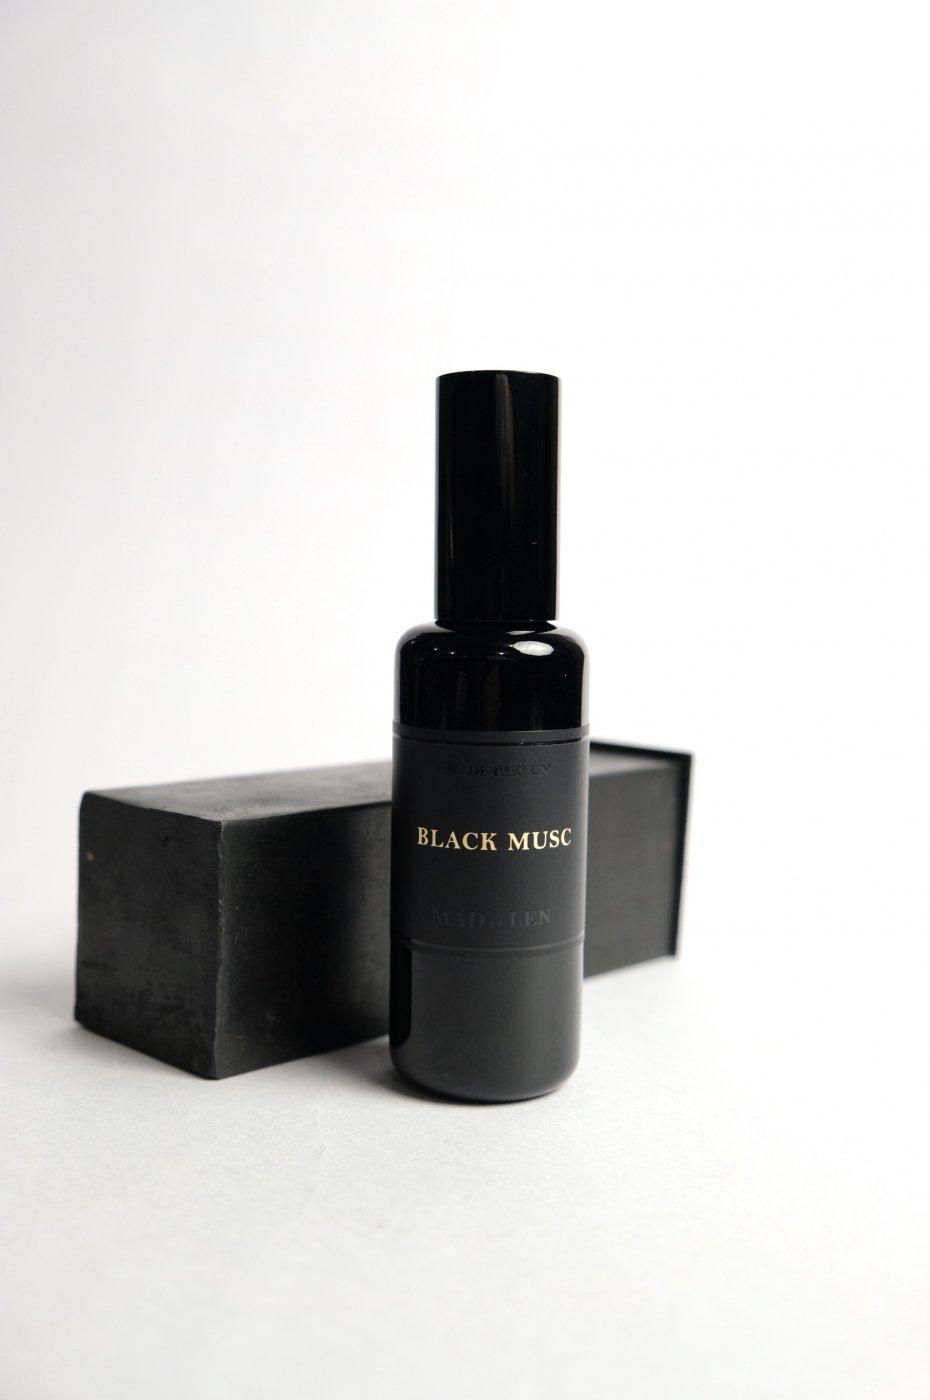 MAD et LEN マドエレン-EAU DE PARFUME 50ml (PARFUM MIST) パルファンミスト-BLACK MUSC(ブラックムスク)